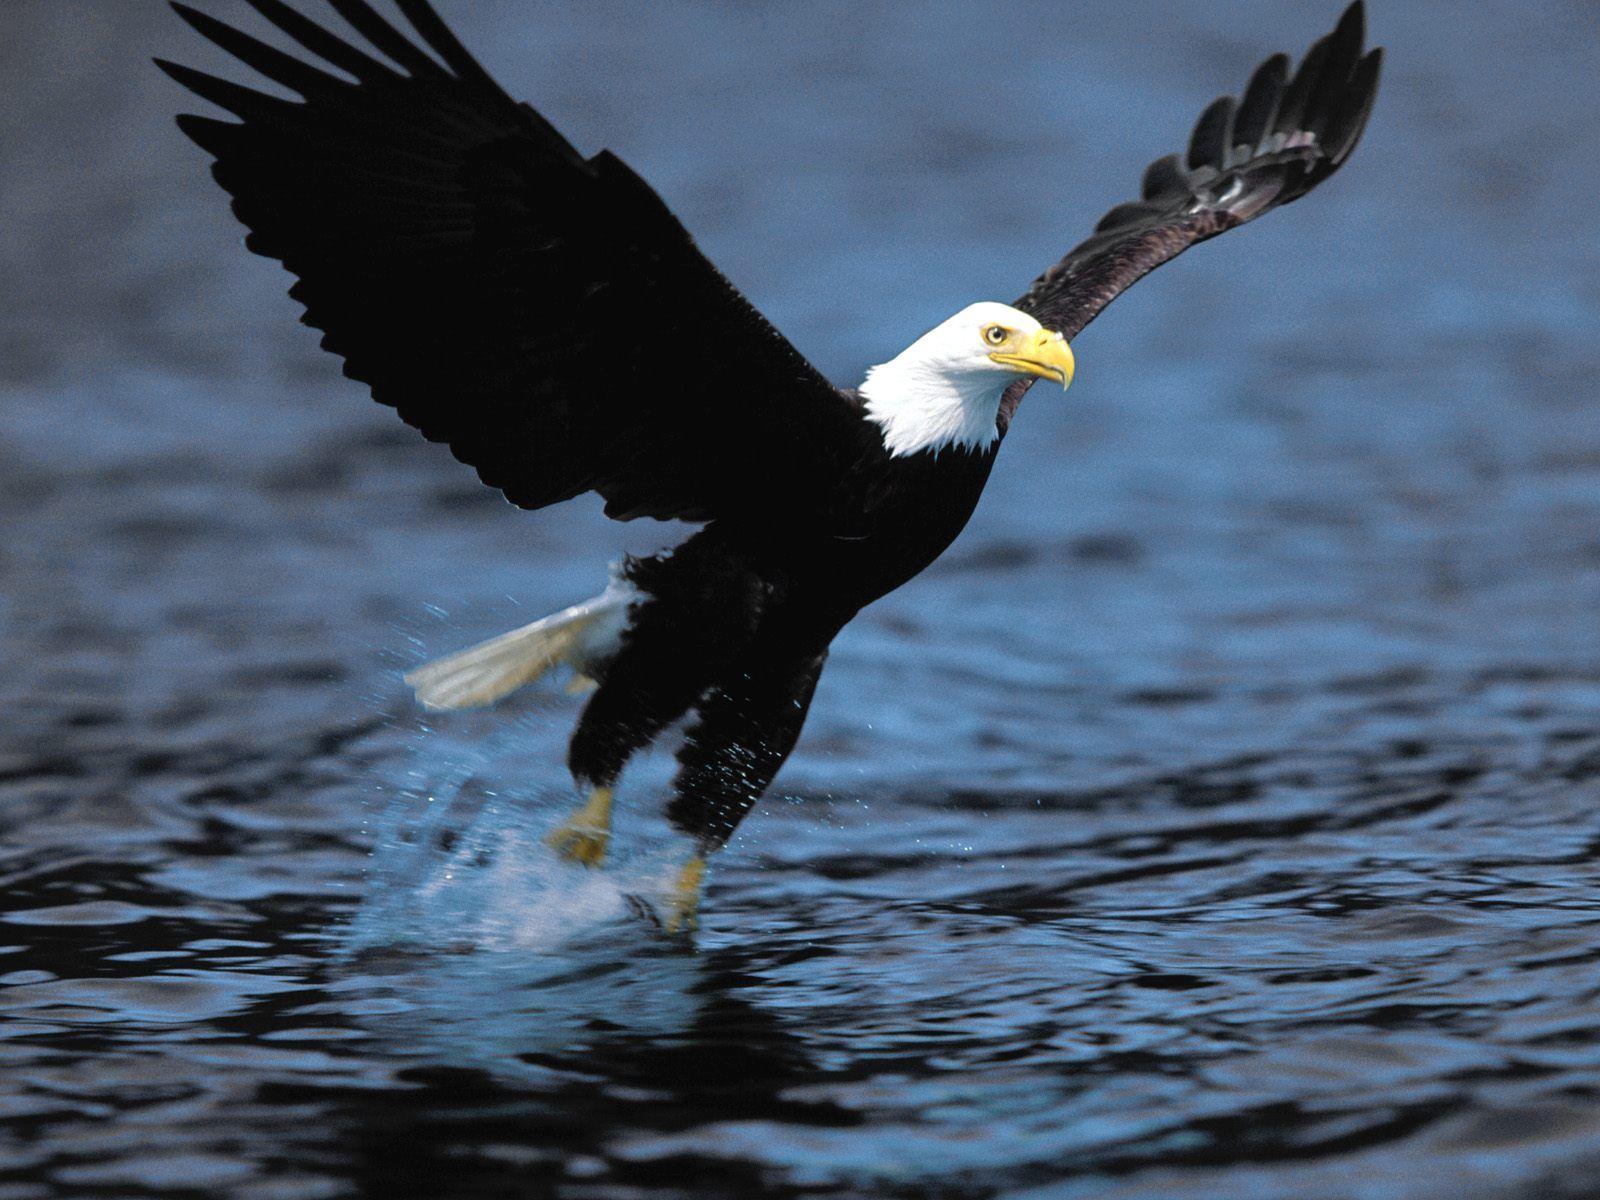 Must see   Wallpaper Horse Eagle - Screaming-Eagle+02  Photograph_18522.jpg